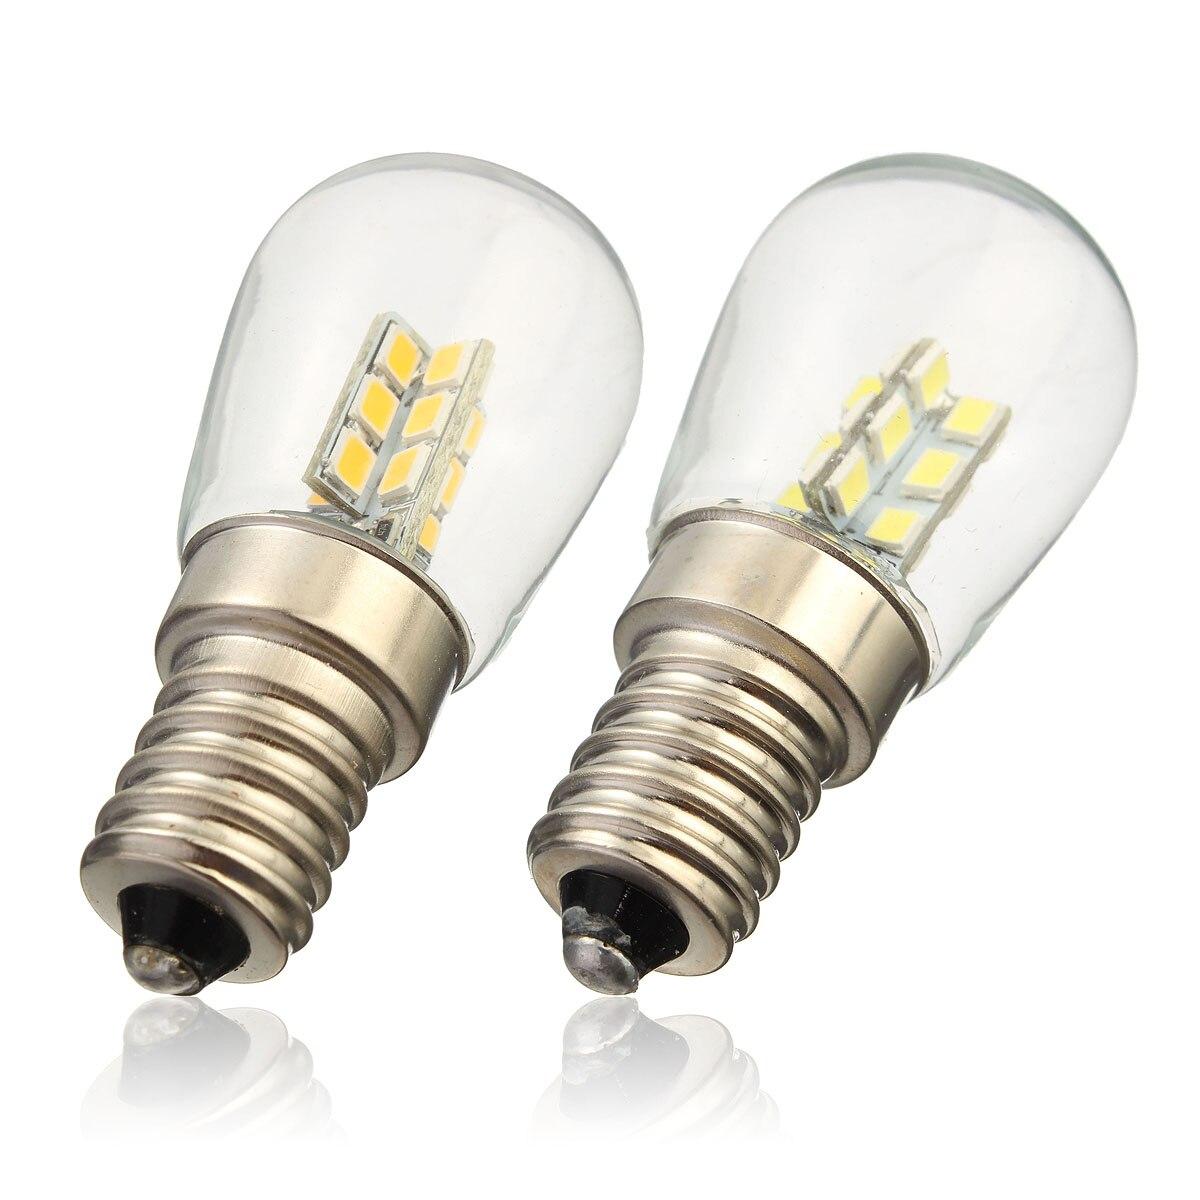 New E14 3014 SMD 24 LED 3W High Bright Silica Gel Light Lamp Bulb For  Refrigerator